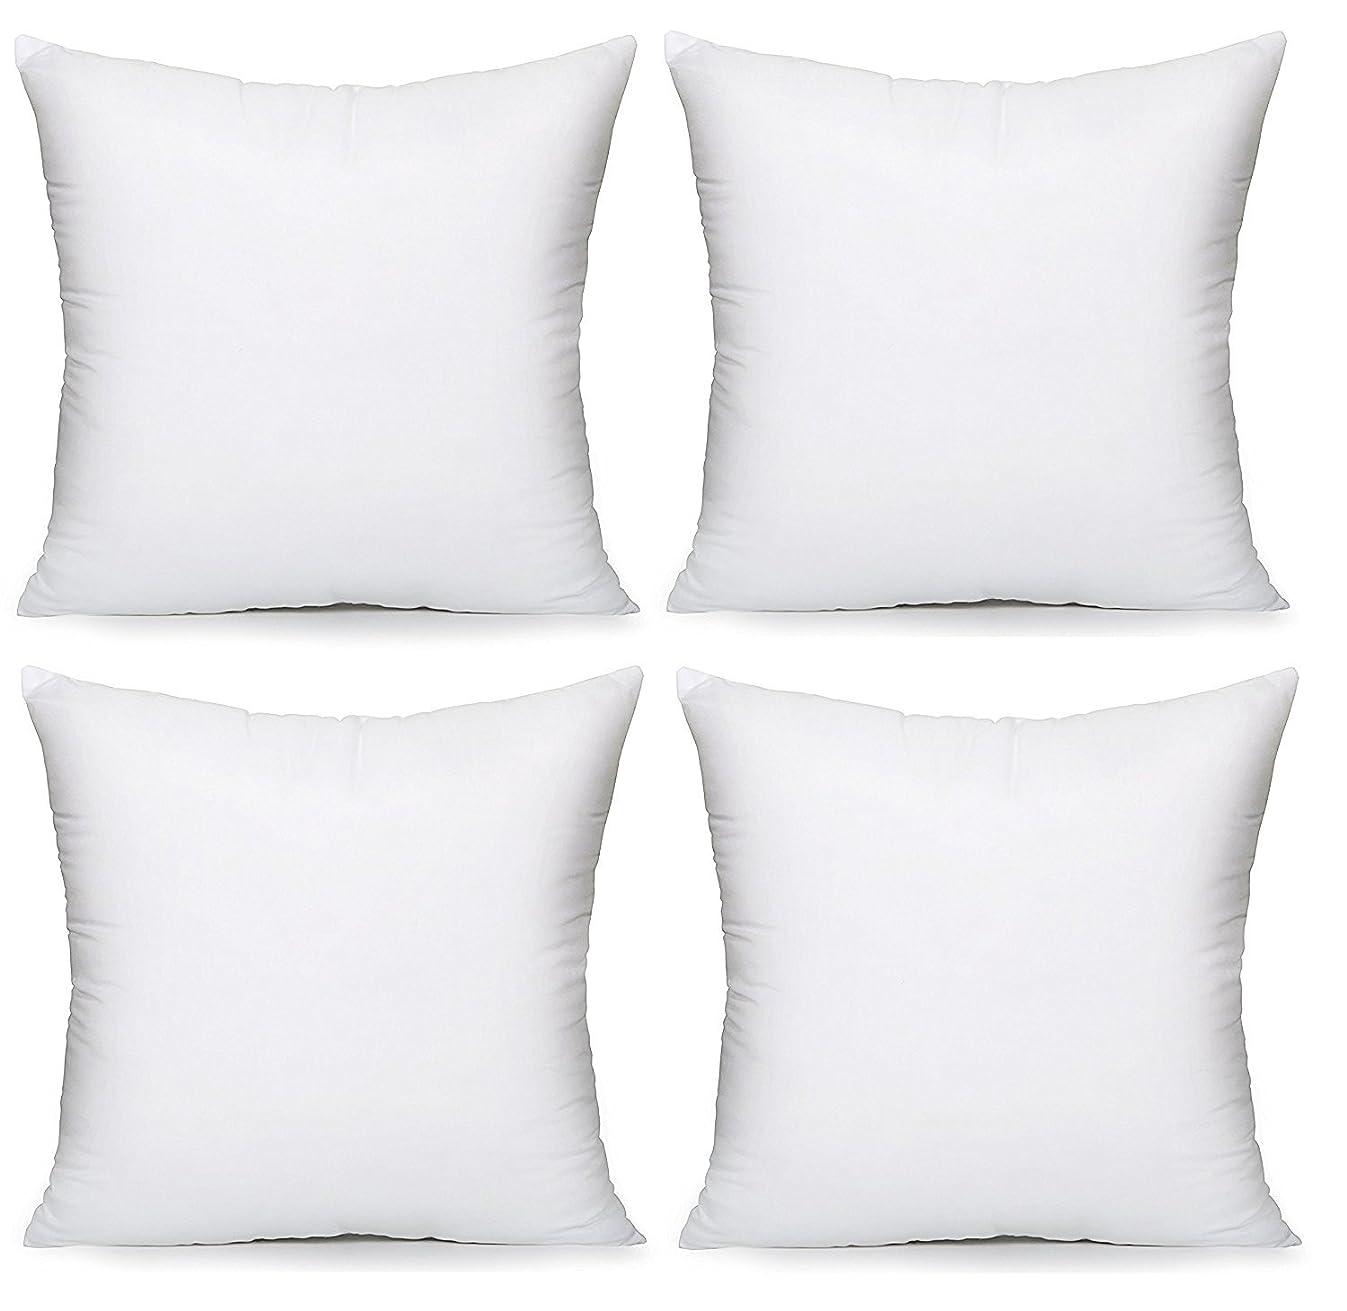 Acanva Hypoallergenic Pillow Insert Form Cushion, Square, 20